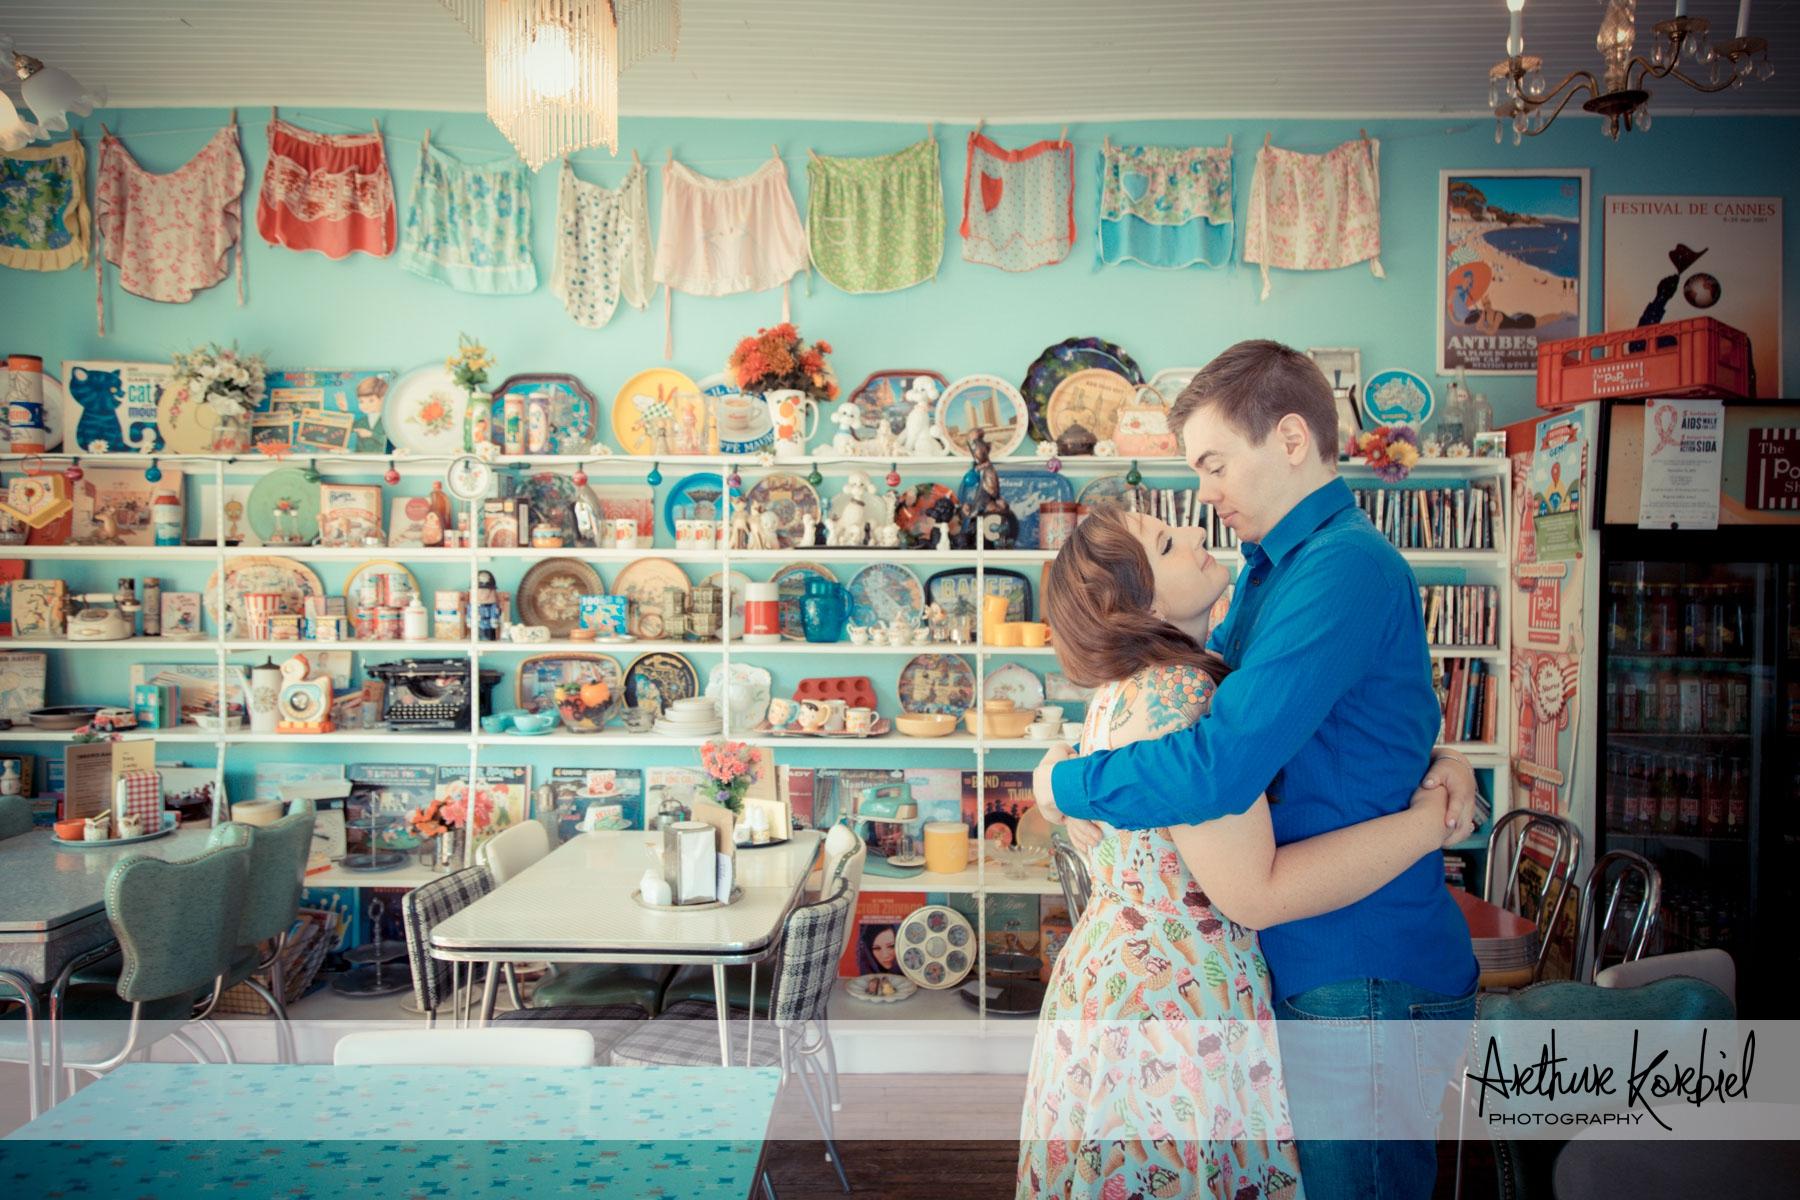 Arthur Korbiel Photography - London Engagement Photographer - Erin &Cameron-012.jpg